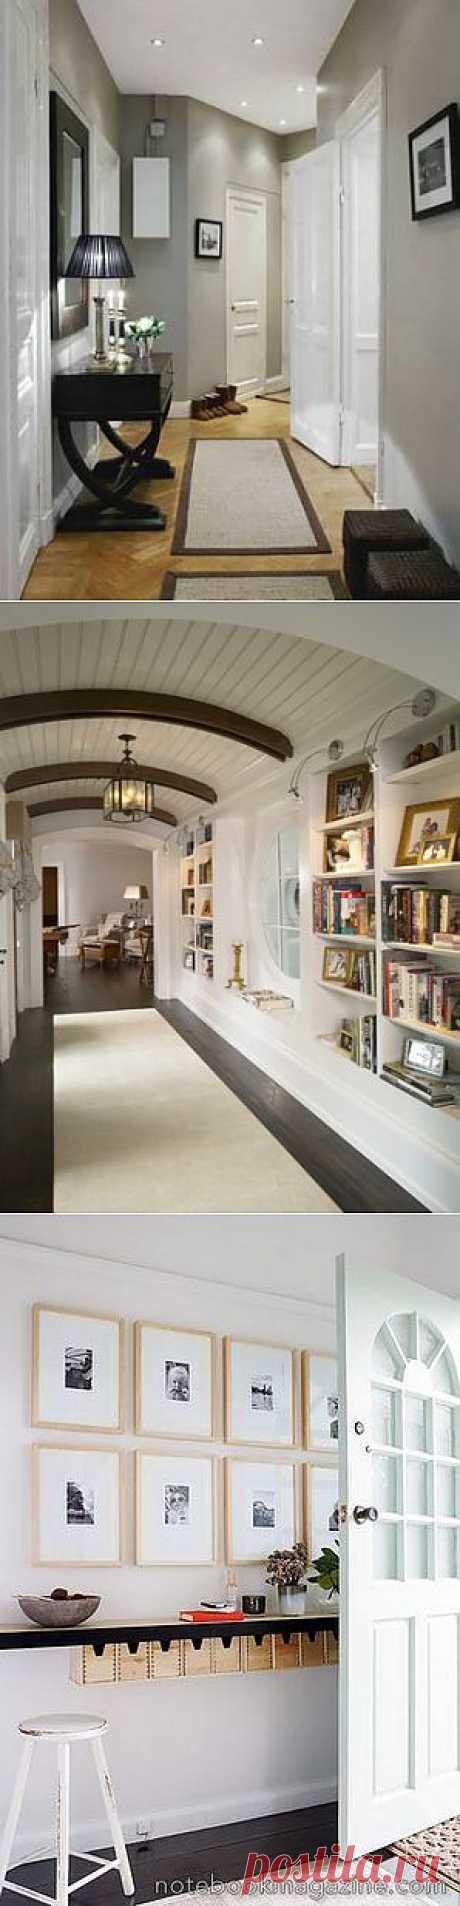 Дизайн коридора | Домфронт